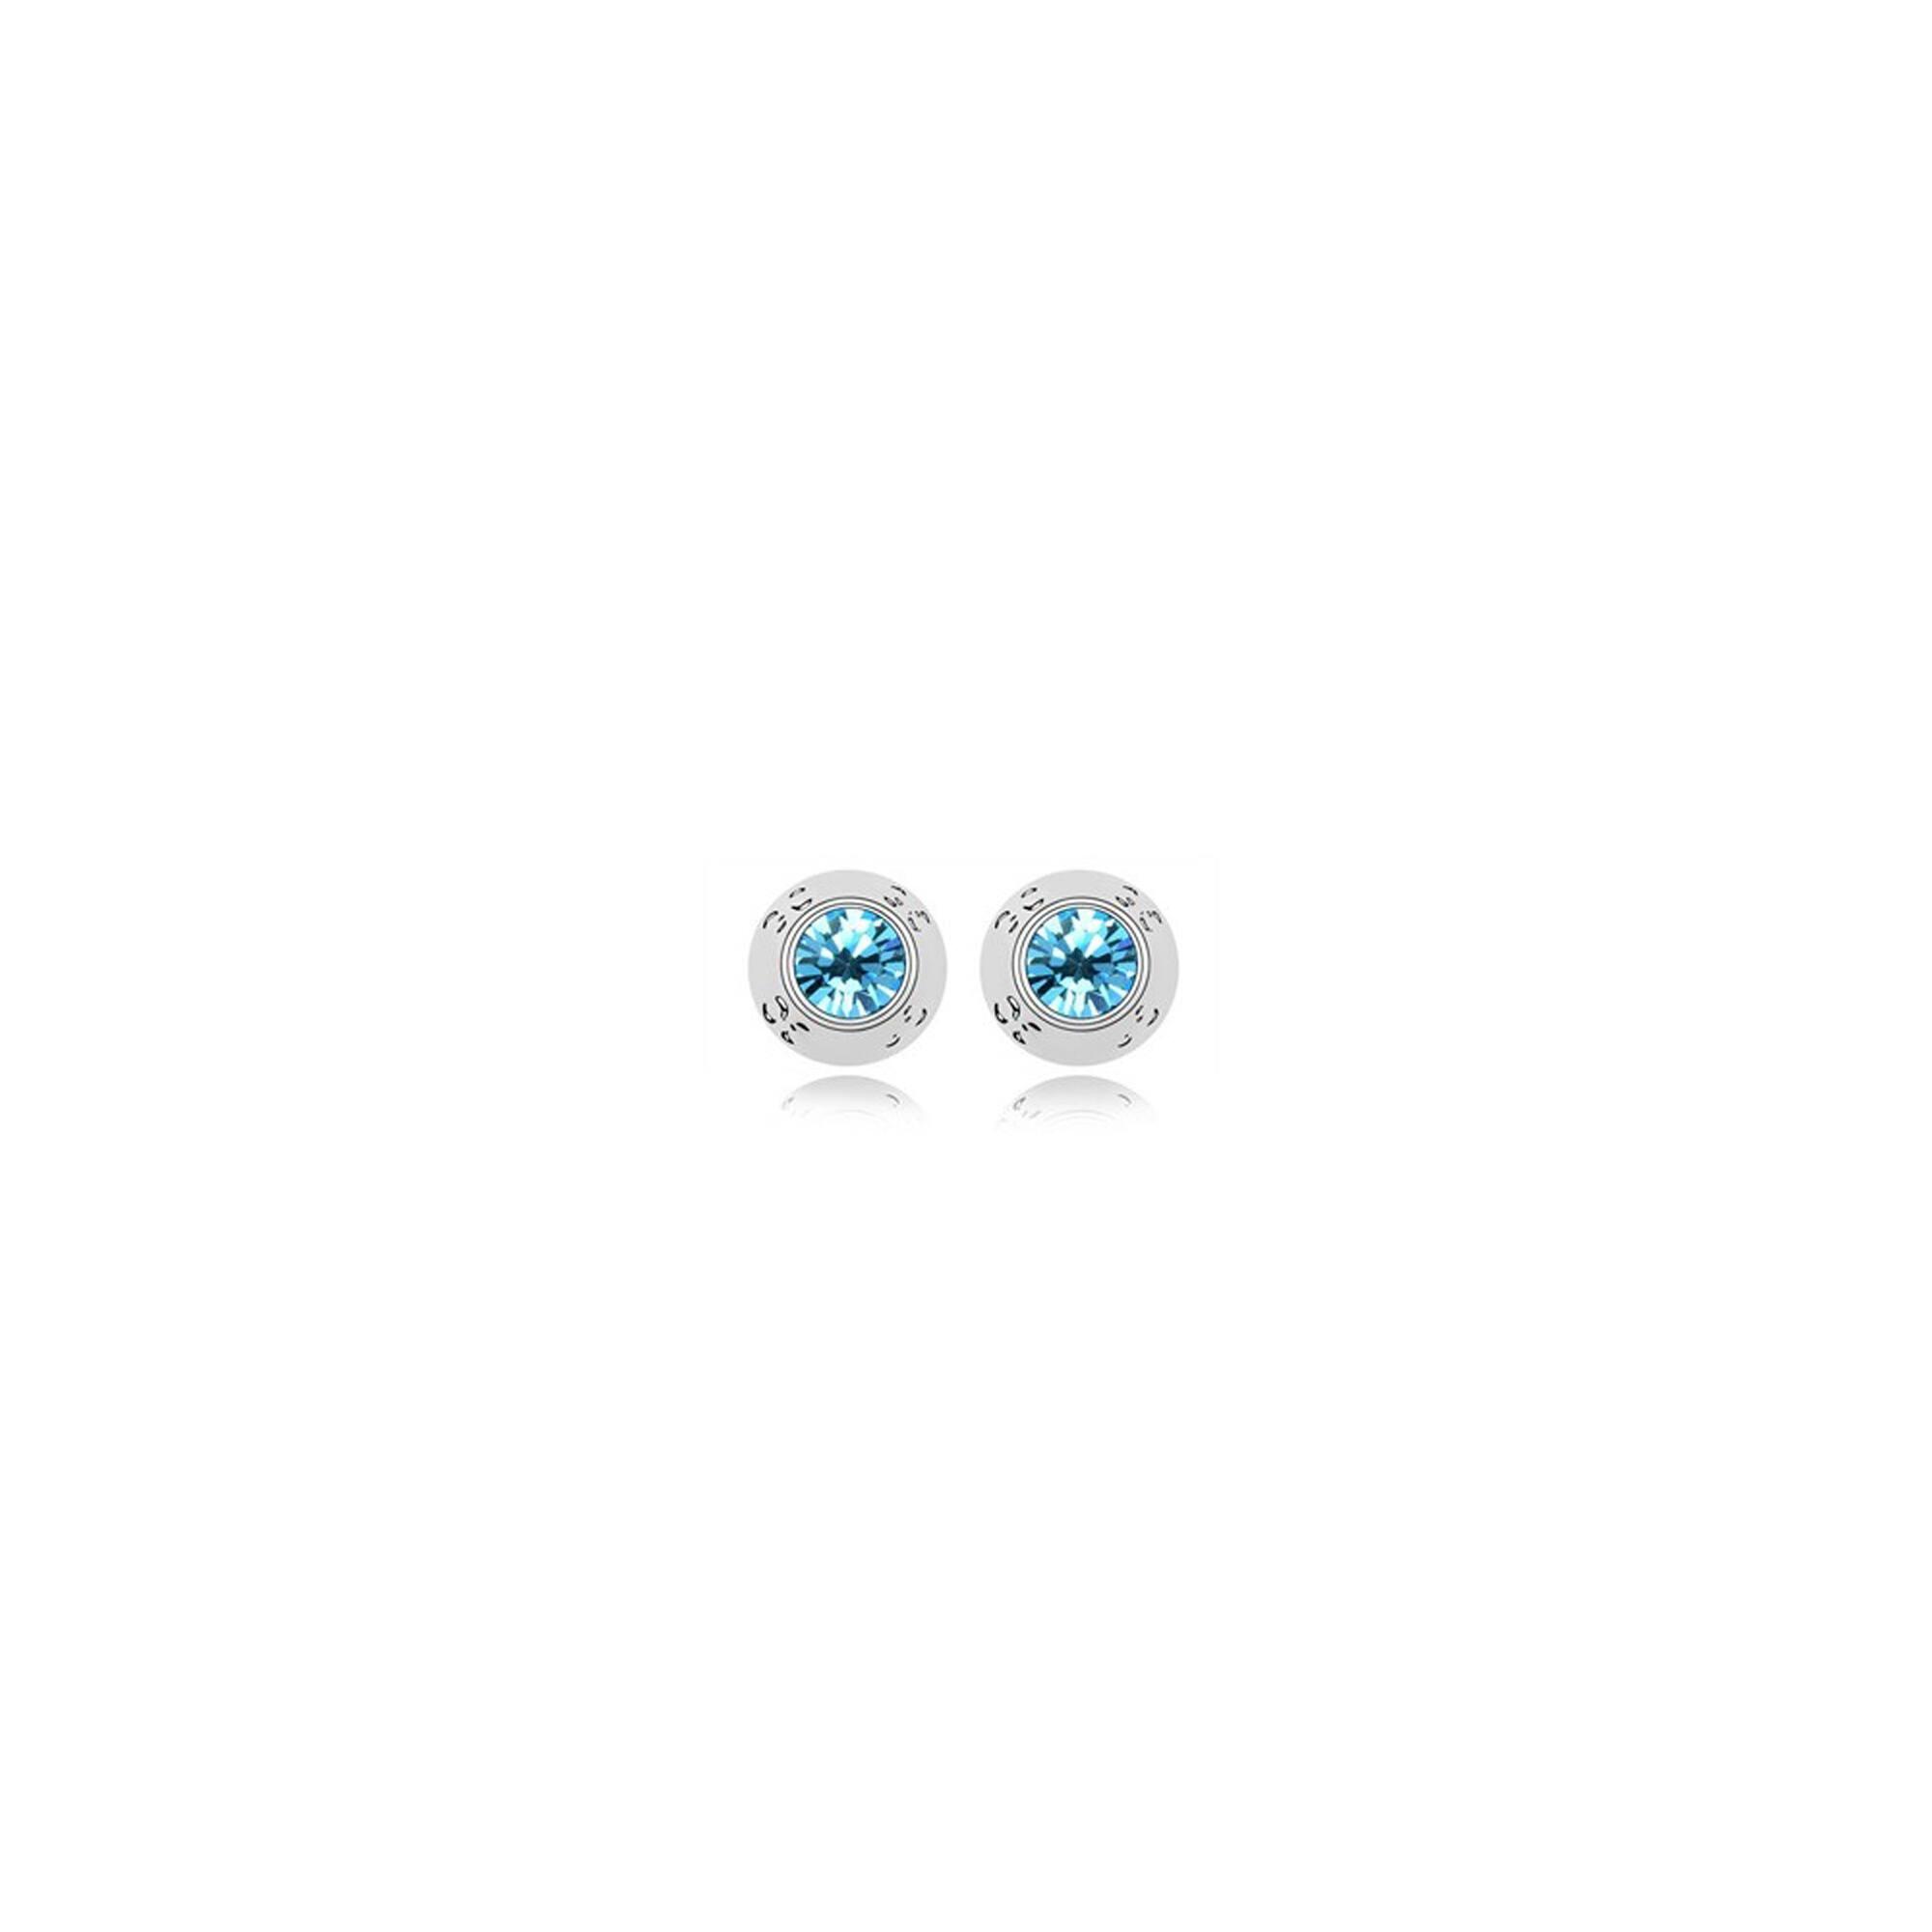 Lady Swarovski kristályos fülbevaló